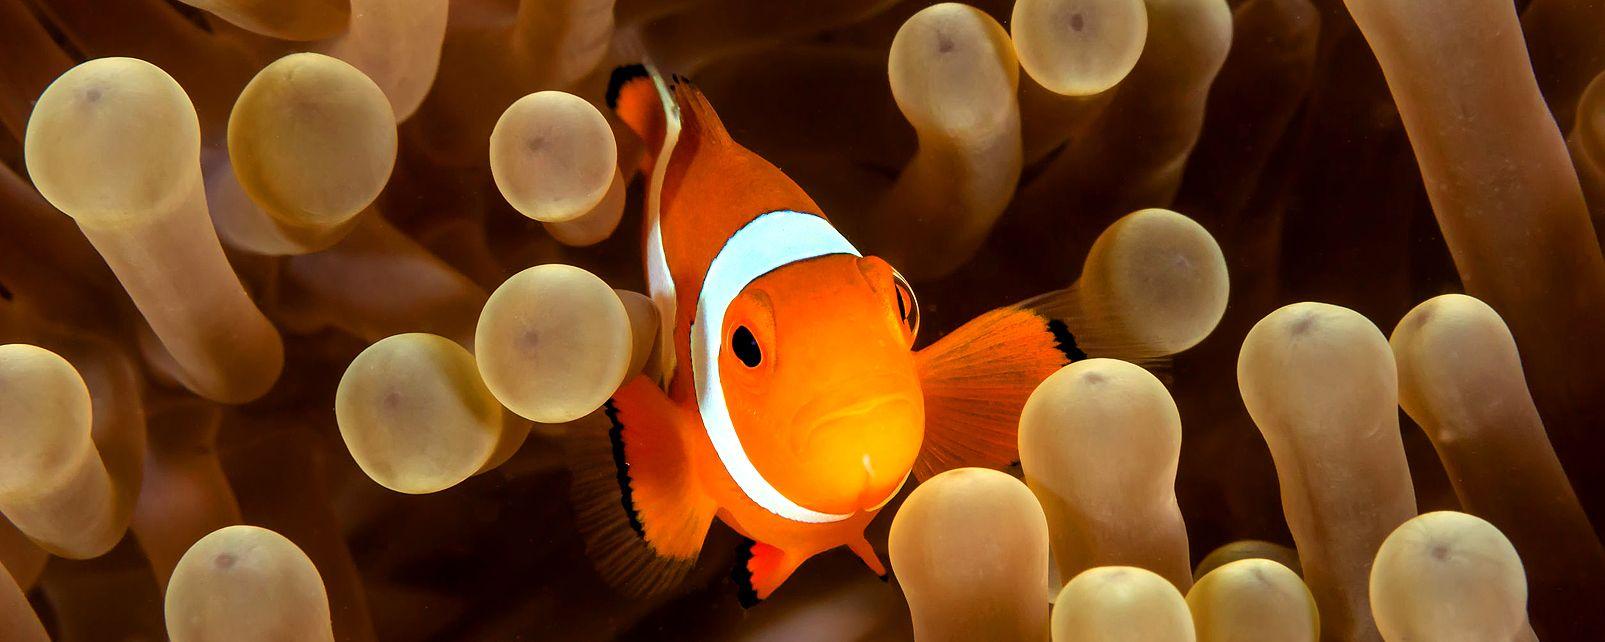 Clownfish, Marine life, The fauna and flora, Dominican Republic